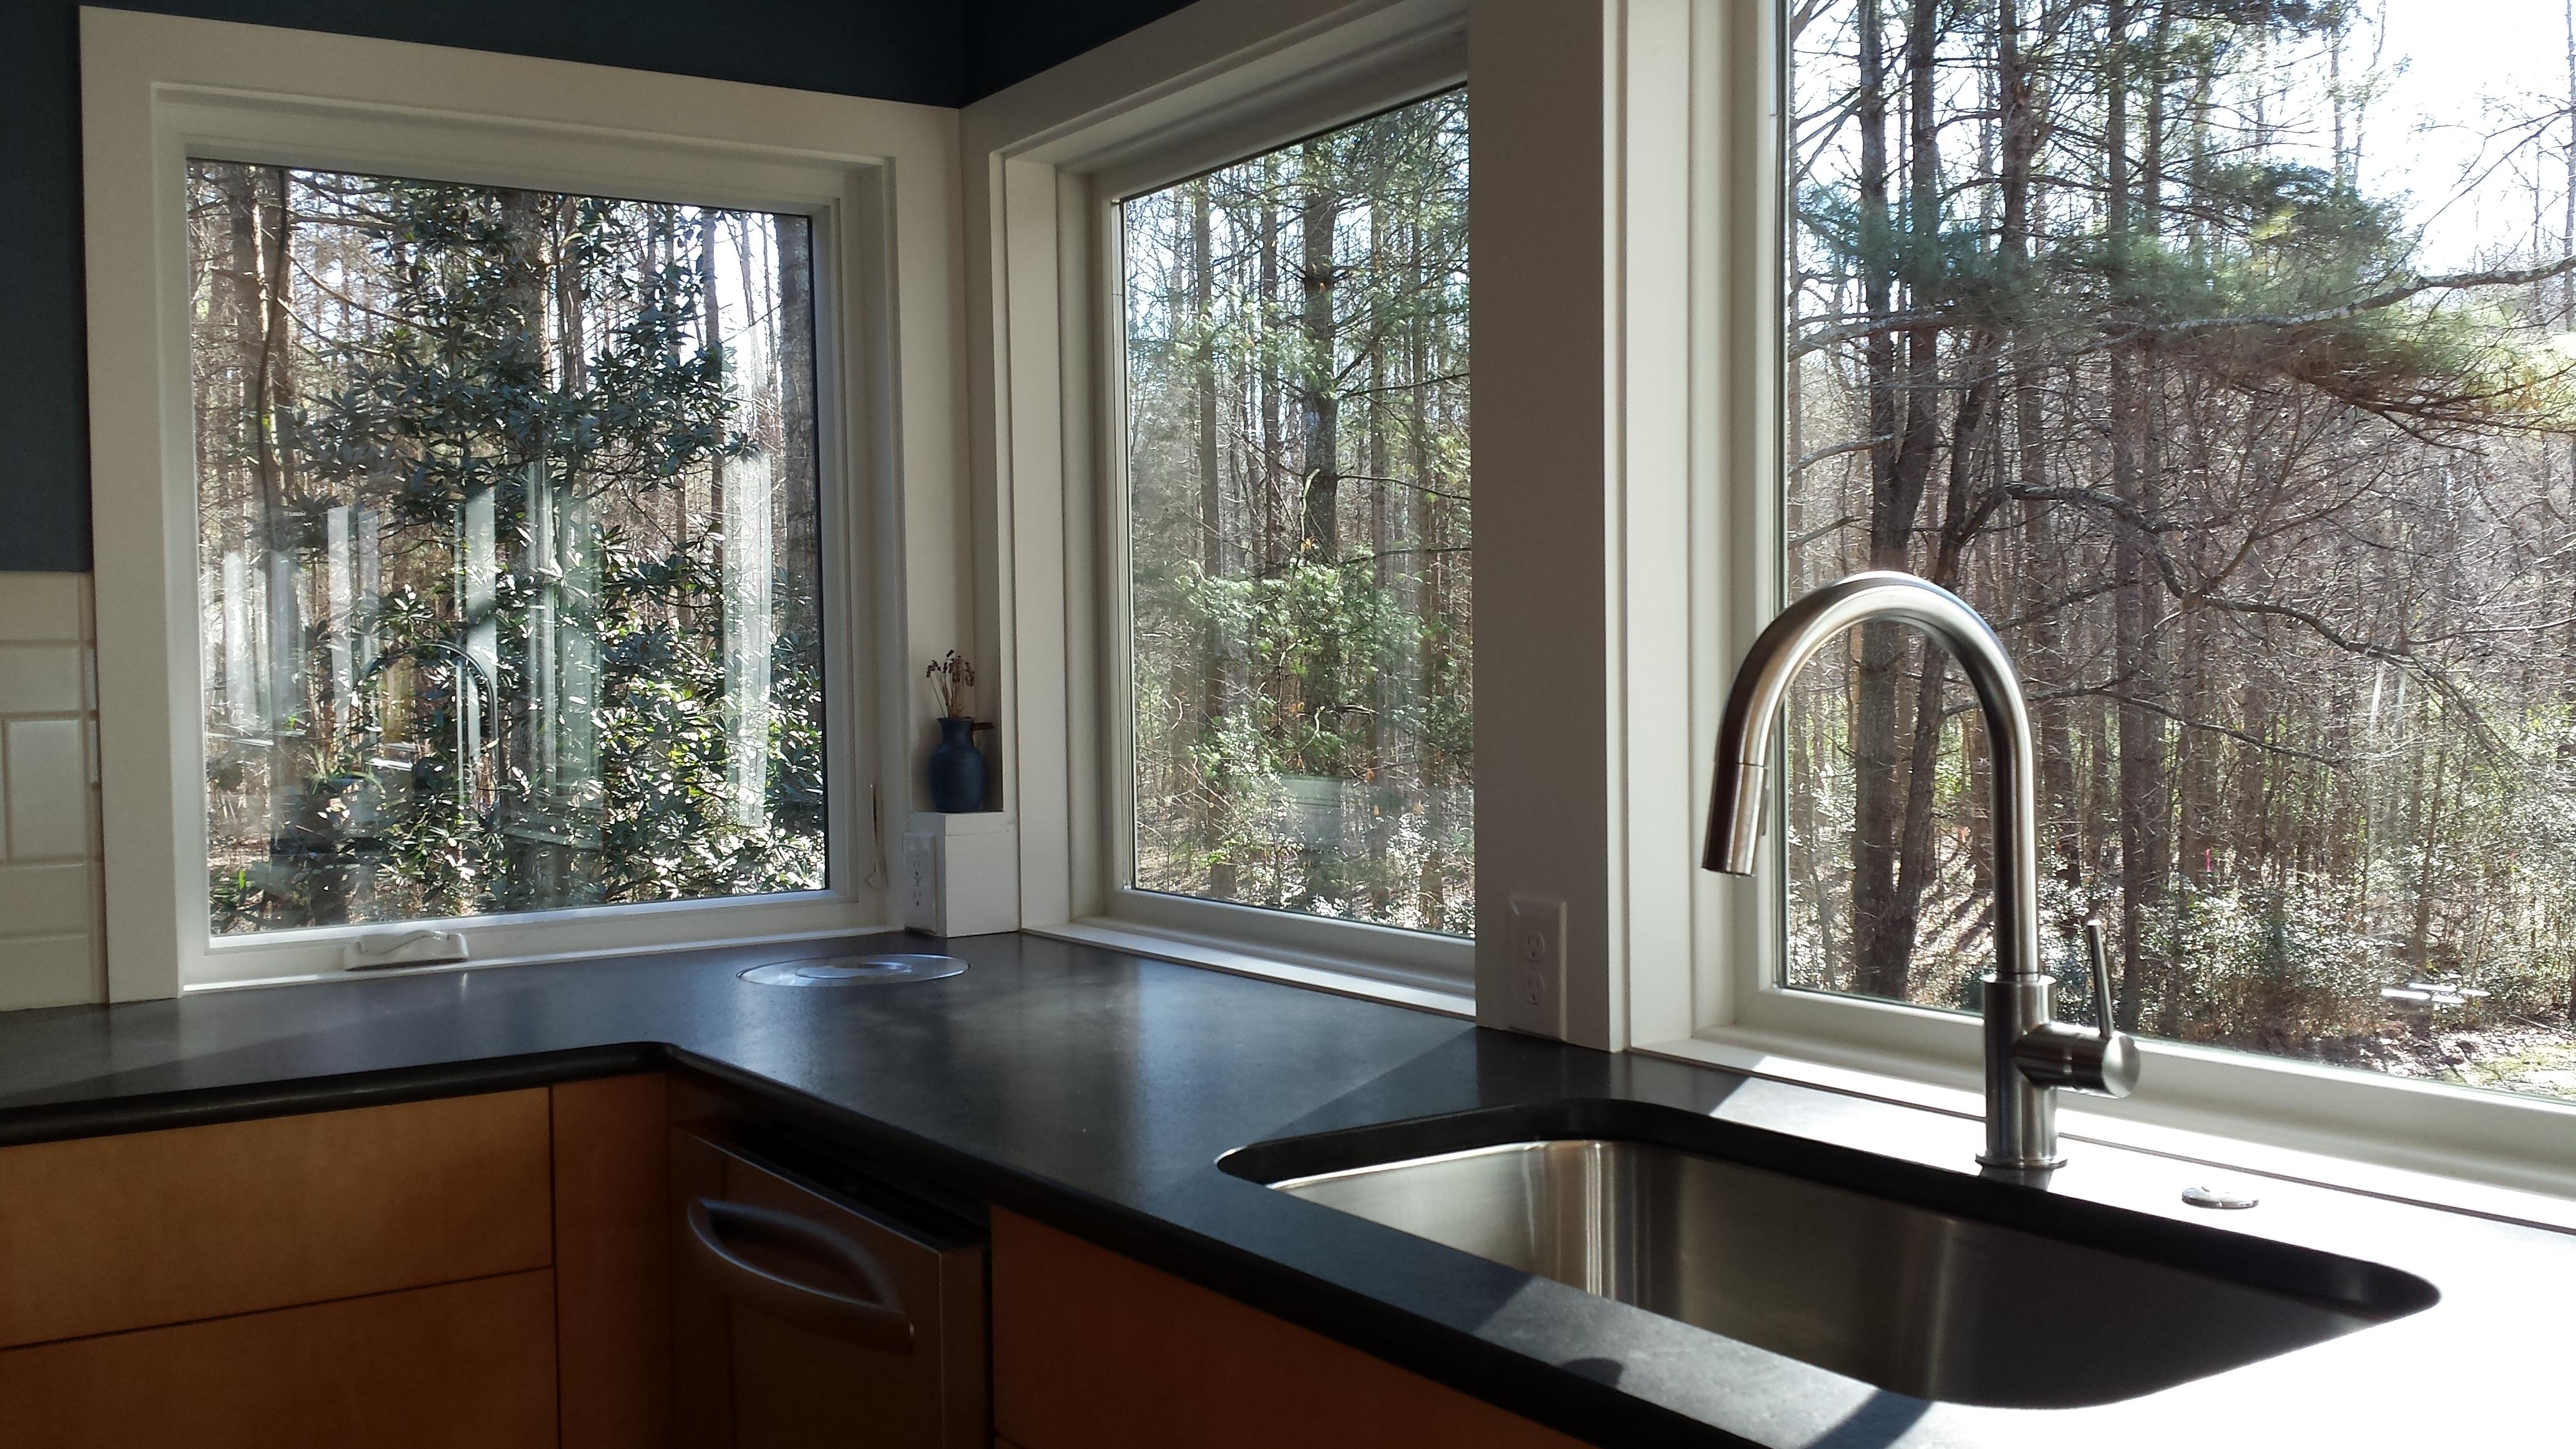 mid century modern renovation modern kitchen faucets Davis Road Kitchen Faucet Best